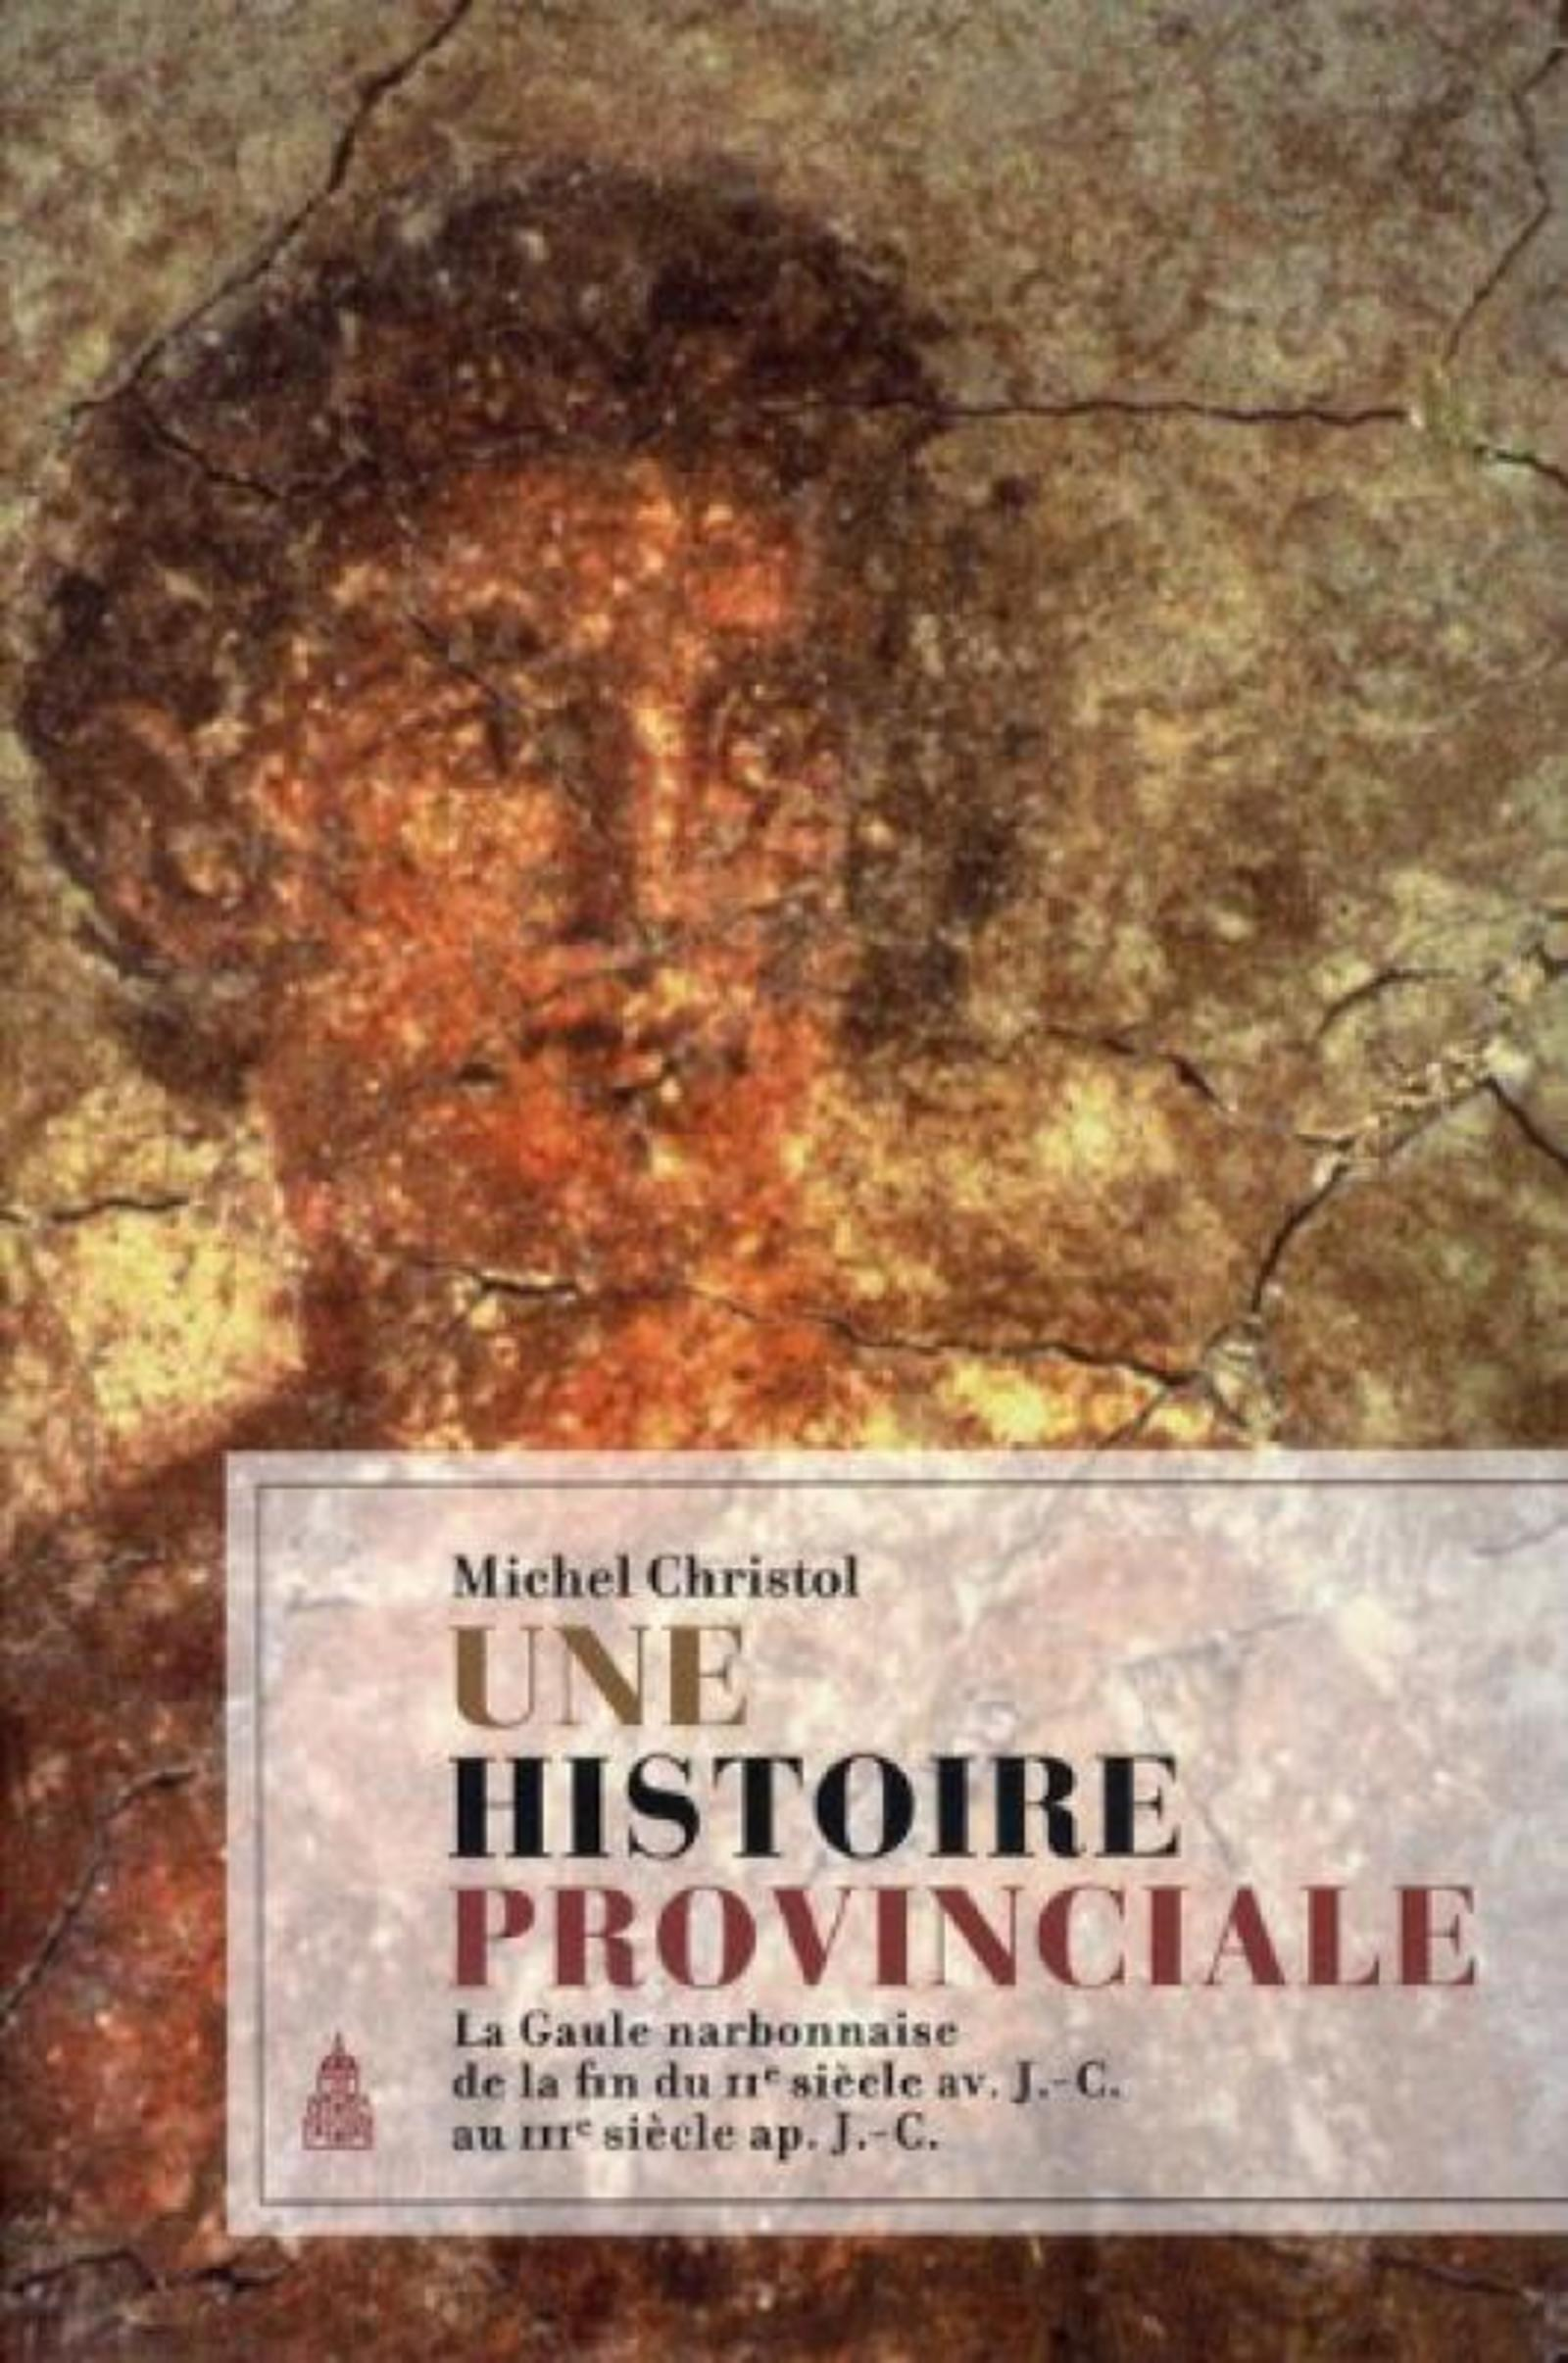 HISTOIRE PROVINCIALE